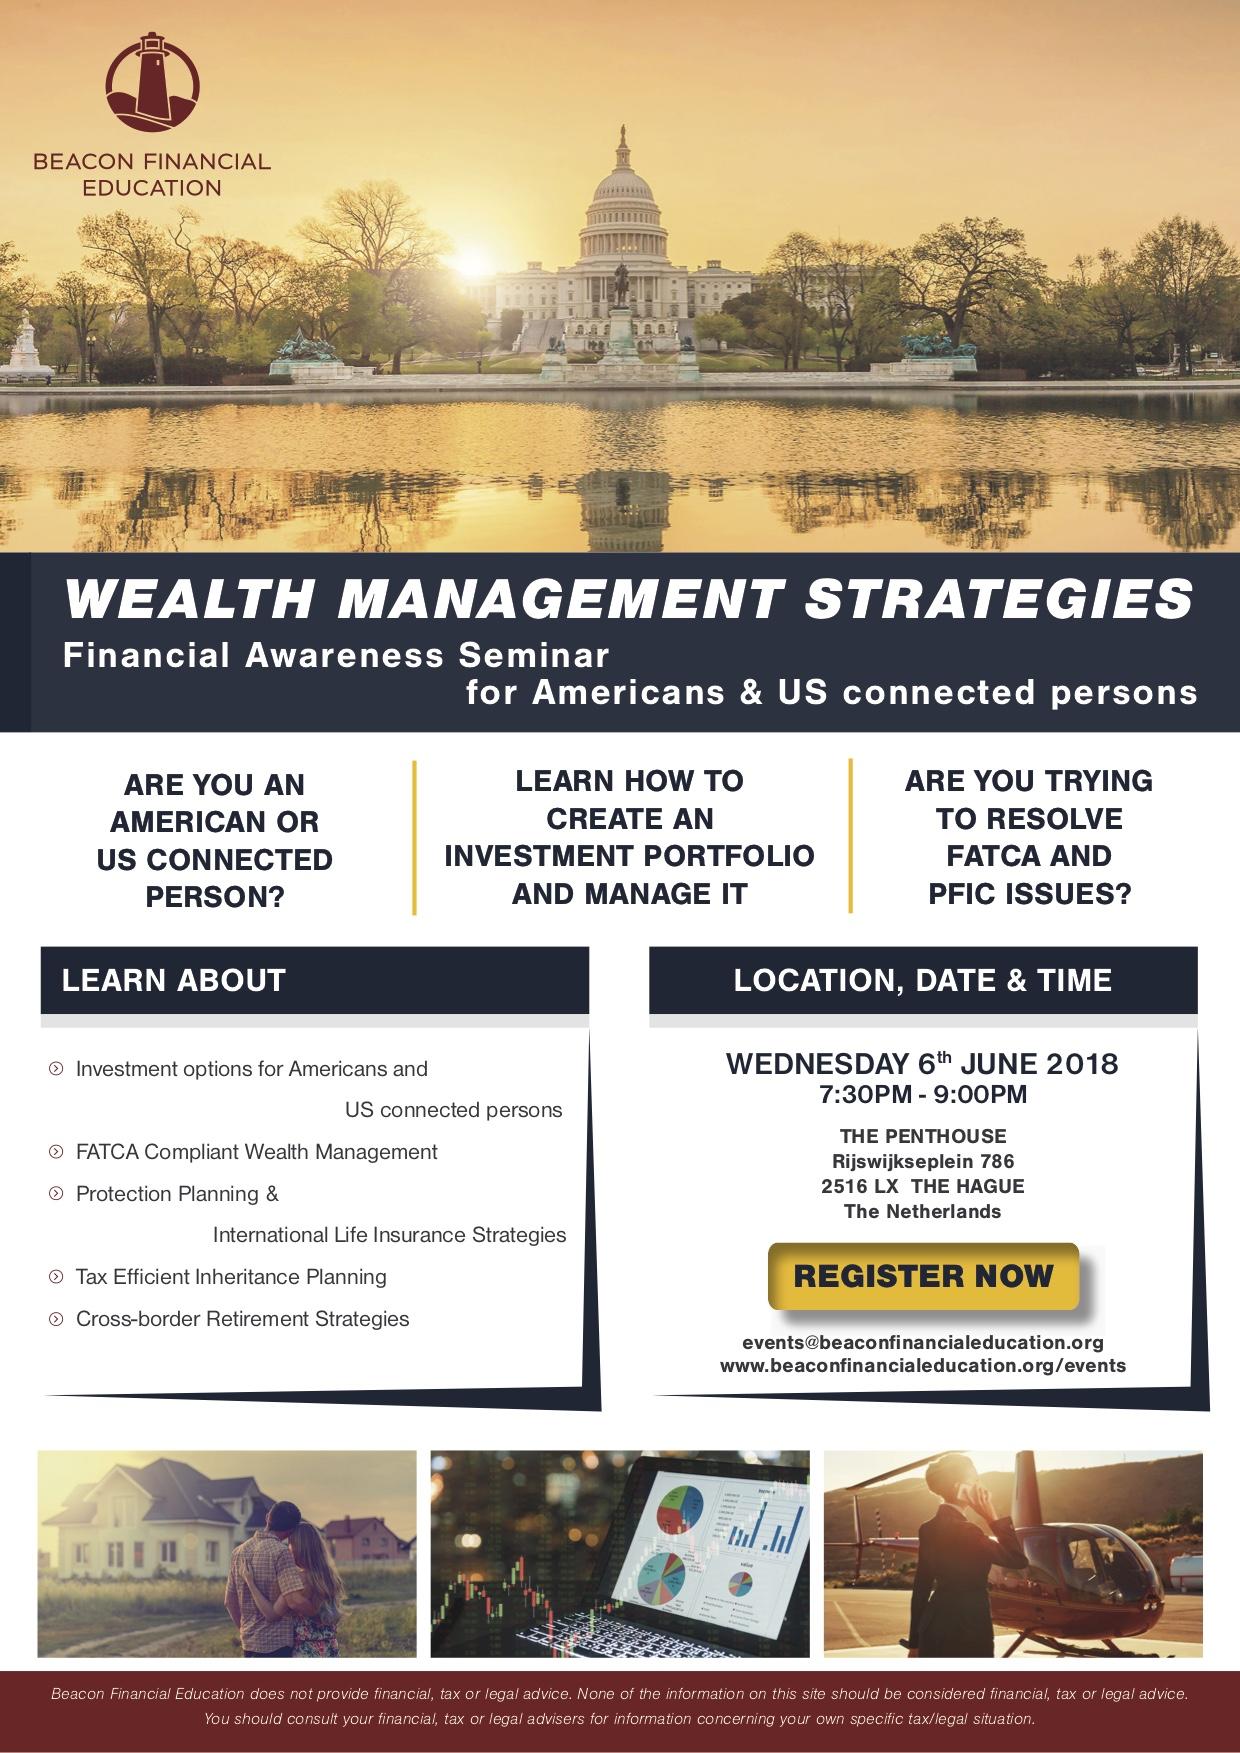 Financial Awareness Seminar The Hague 6 June